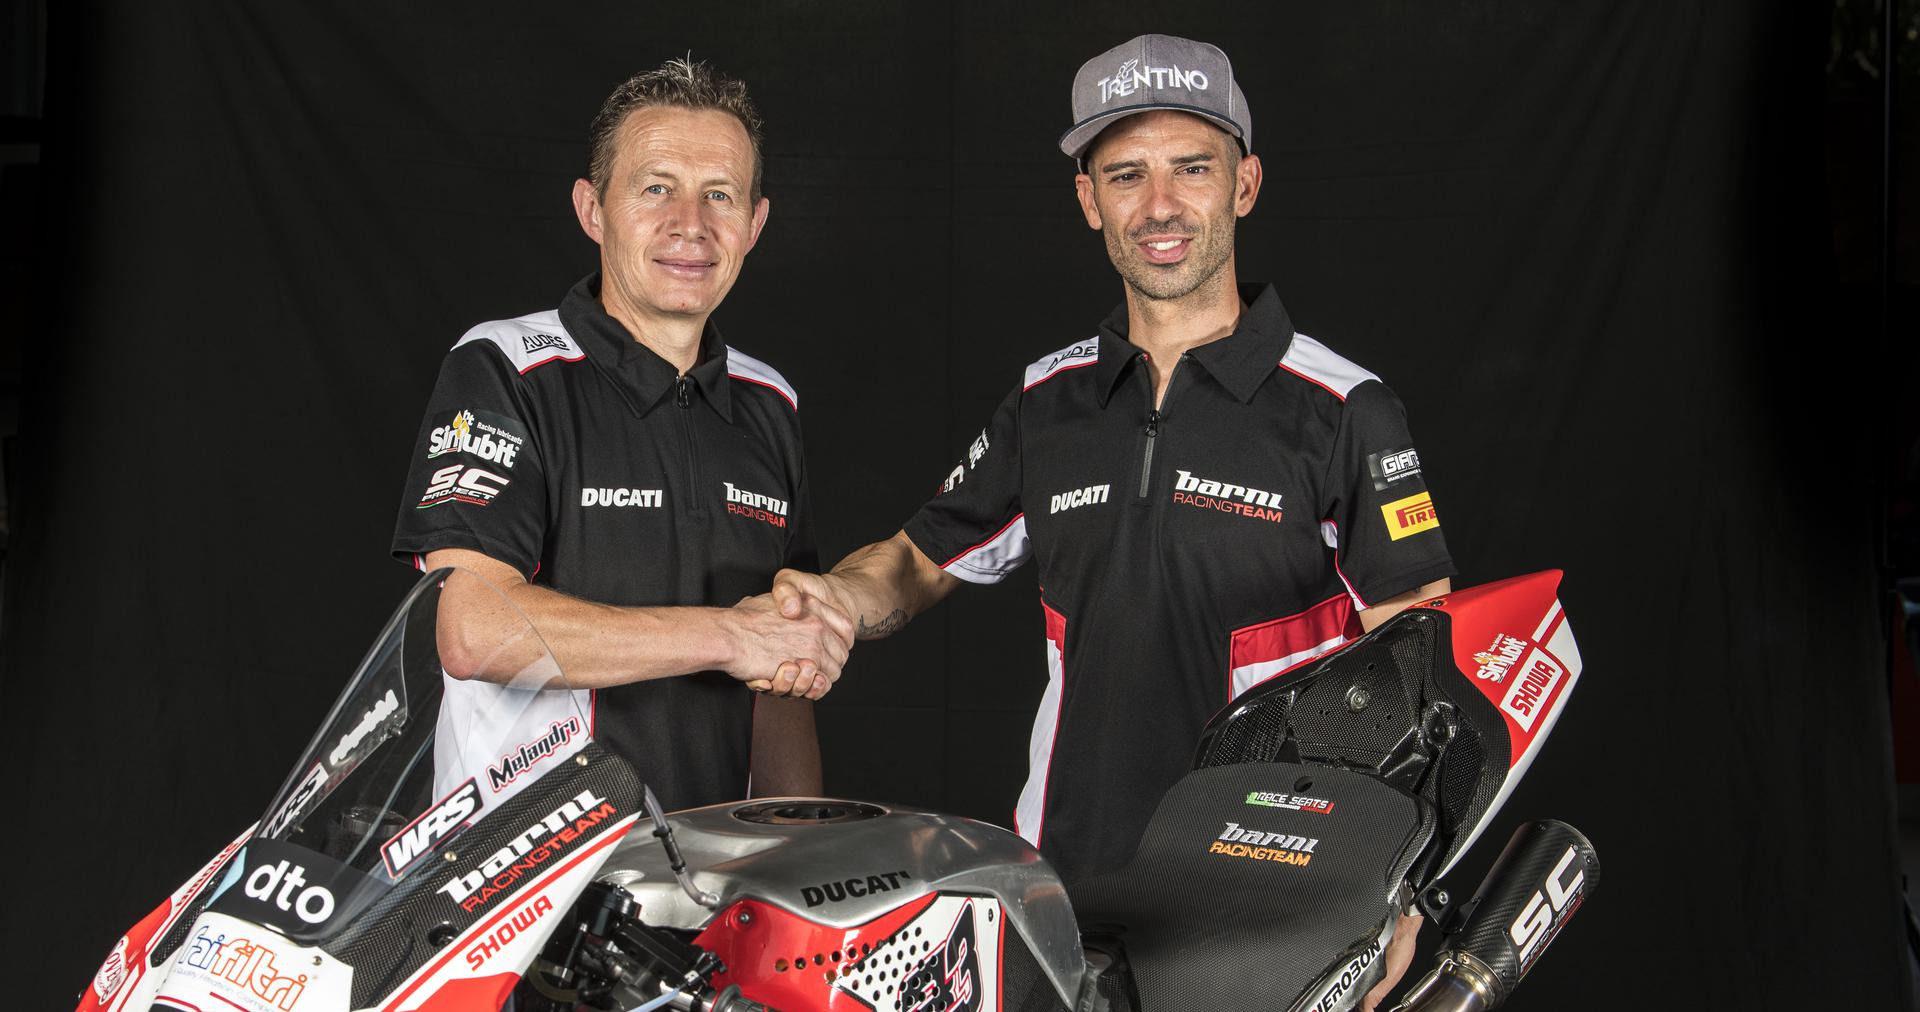 Barni Racing Team Owner Marco Barnabo (left) and Marco Melandri (right). Photo courtesy Barni Racing Team.